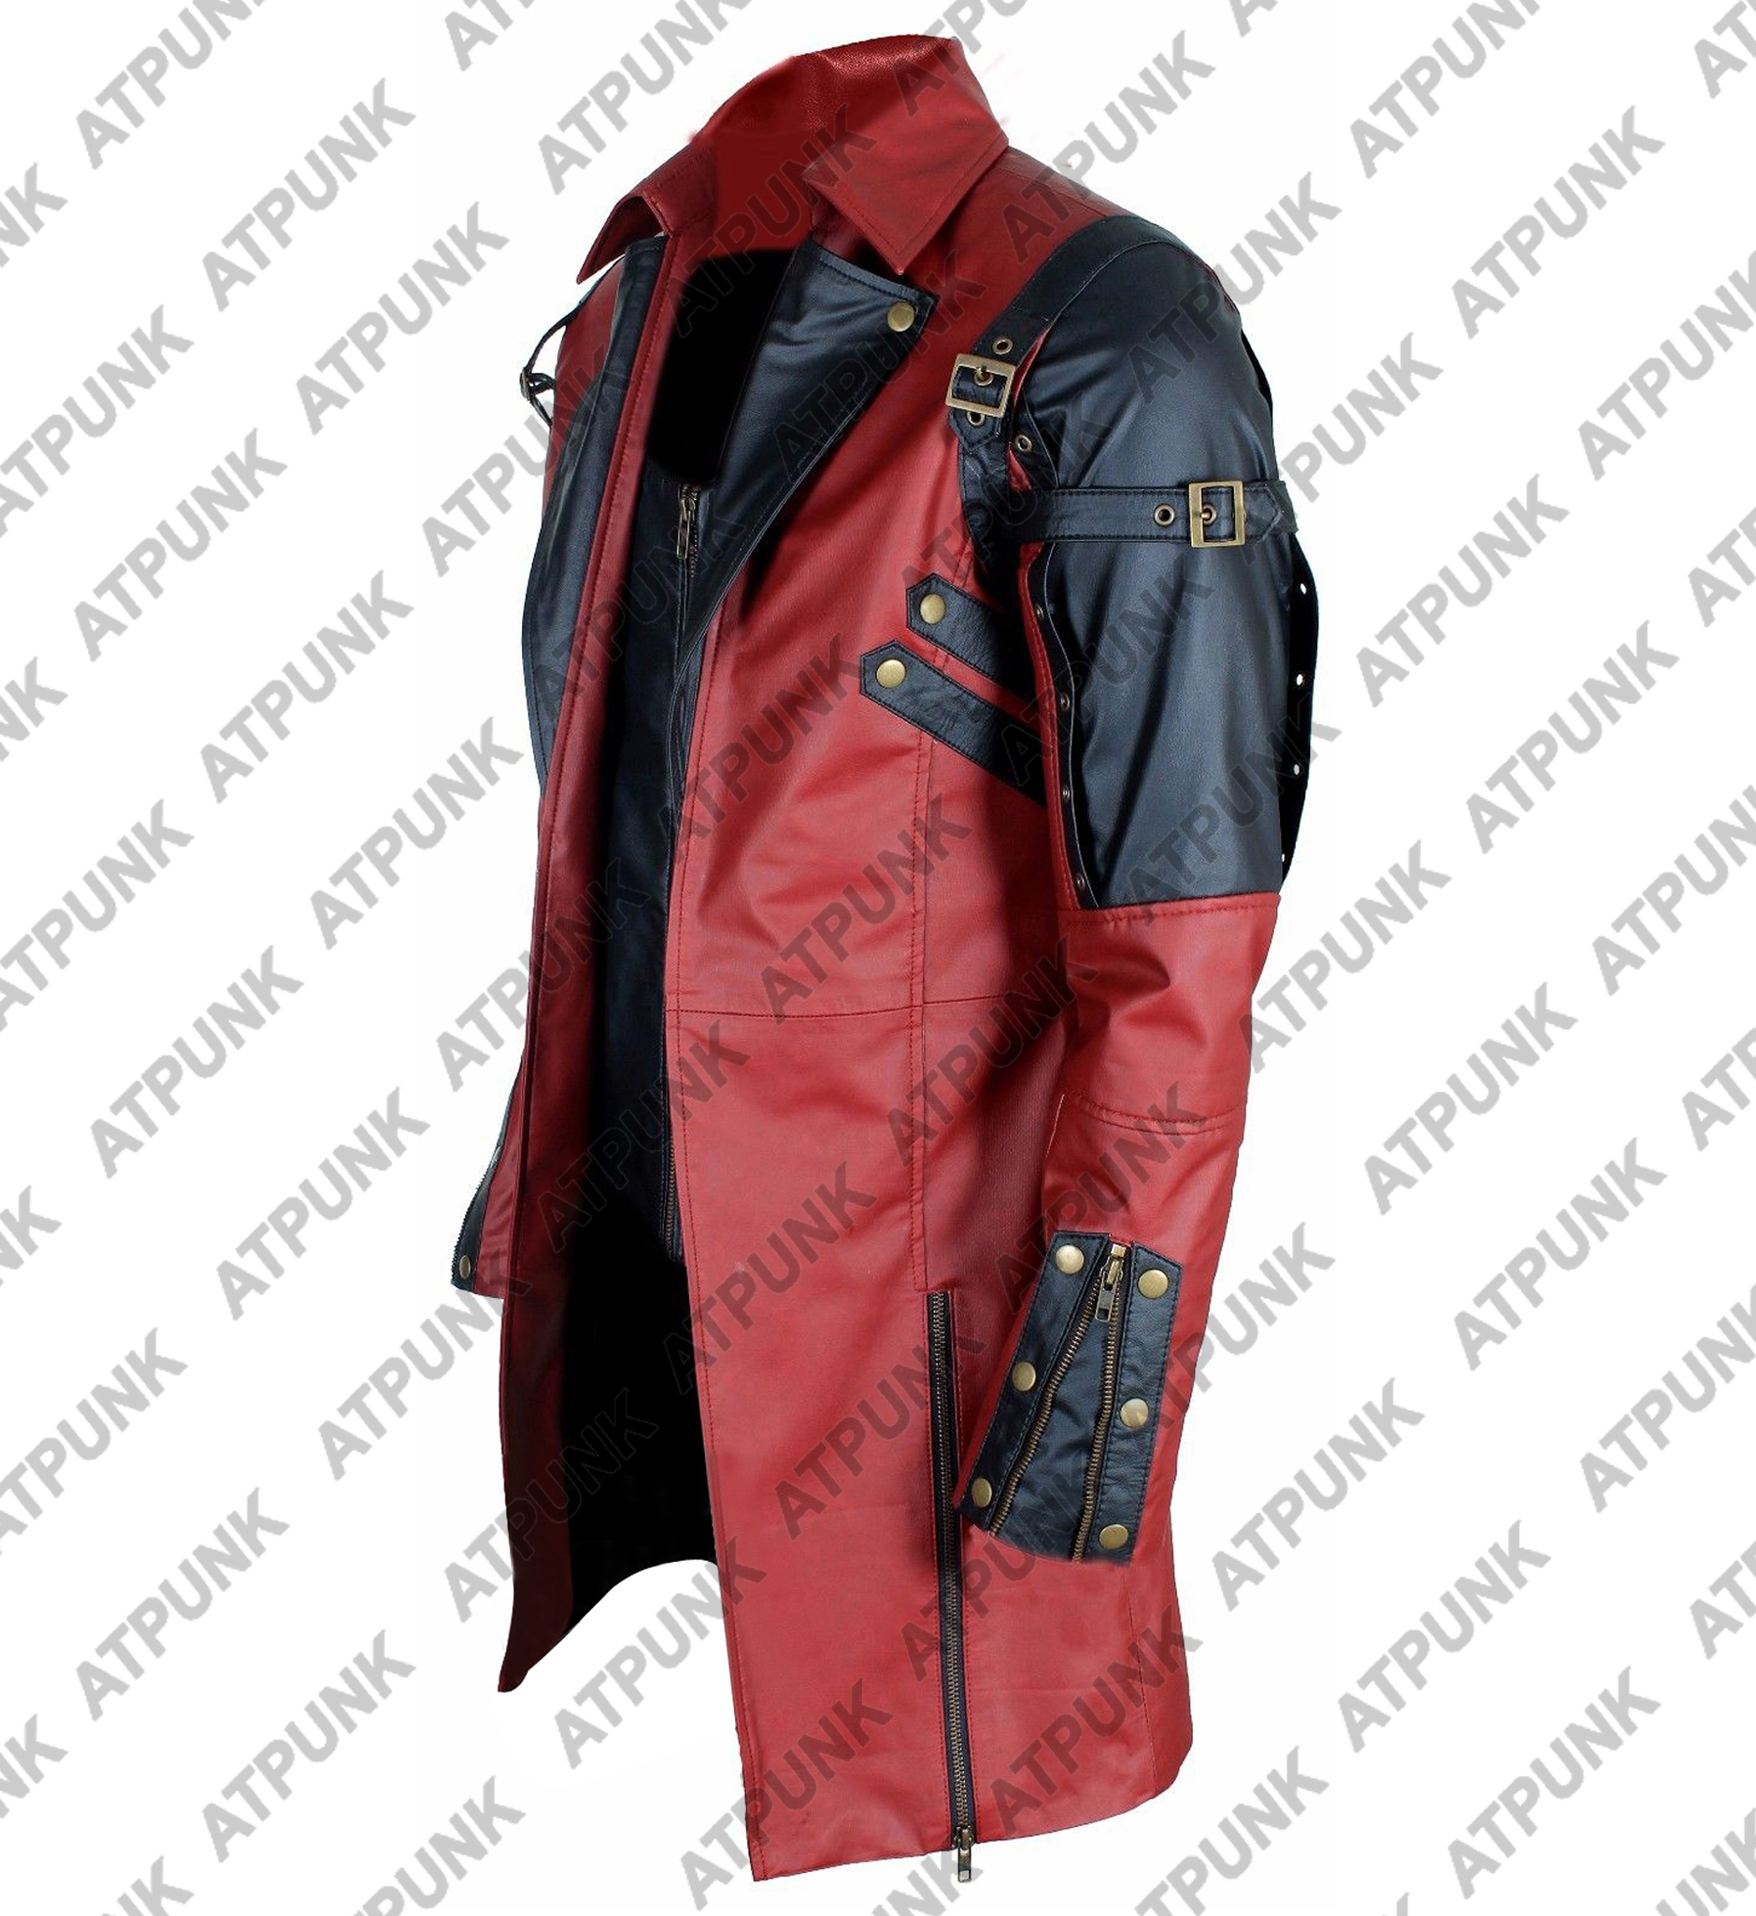 rebelsmarket_men_goth_steampunk_military_jacket_red_black_faux_leather_poison_jacket_jackets_2.jpg